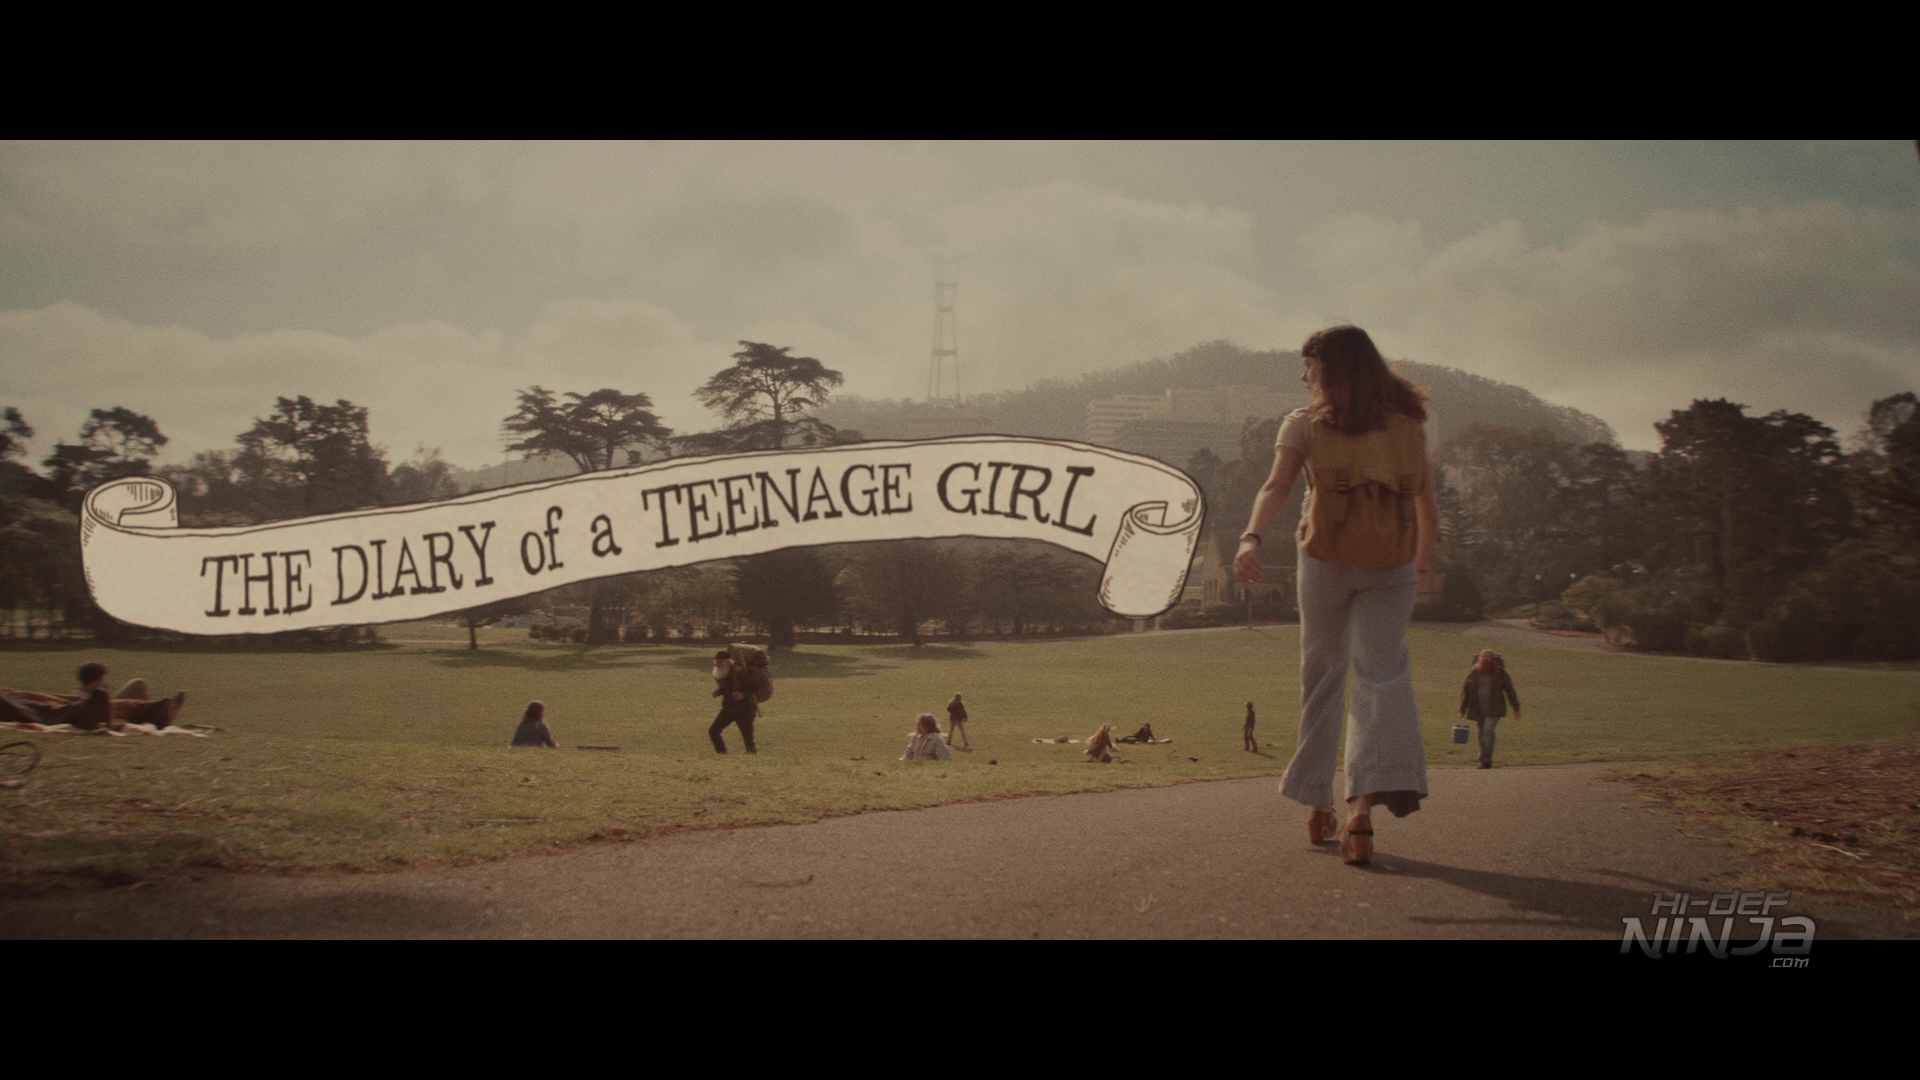 Diary of a Teenage Girl (2)